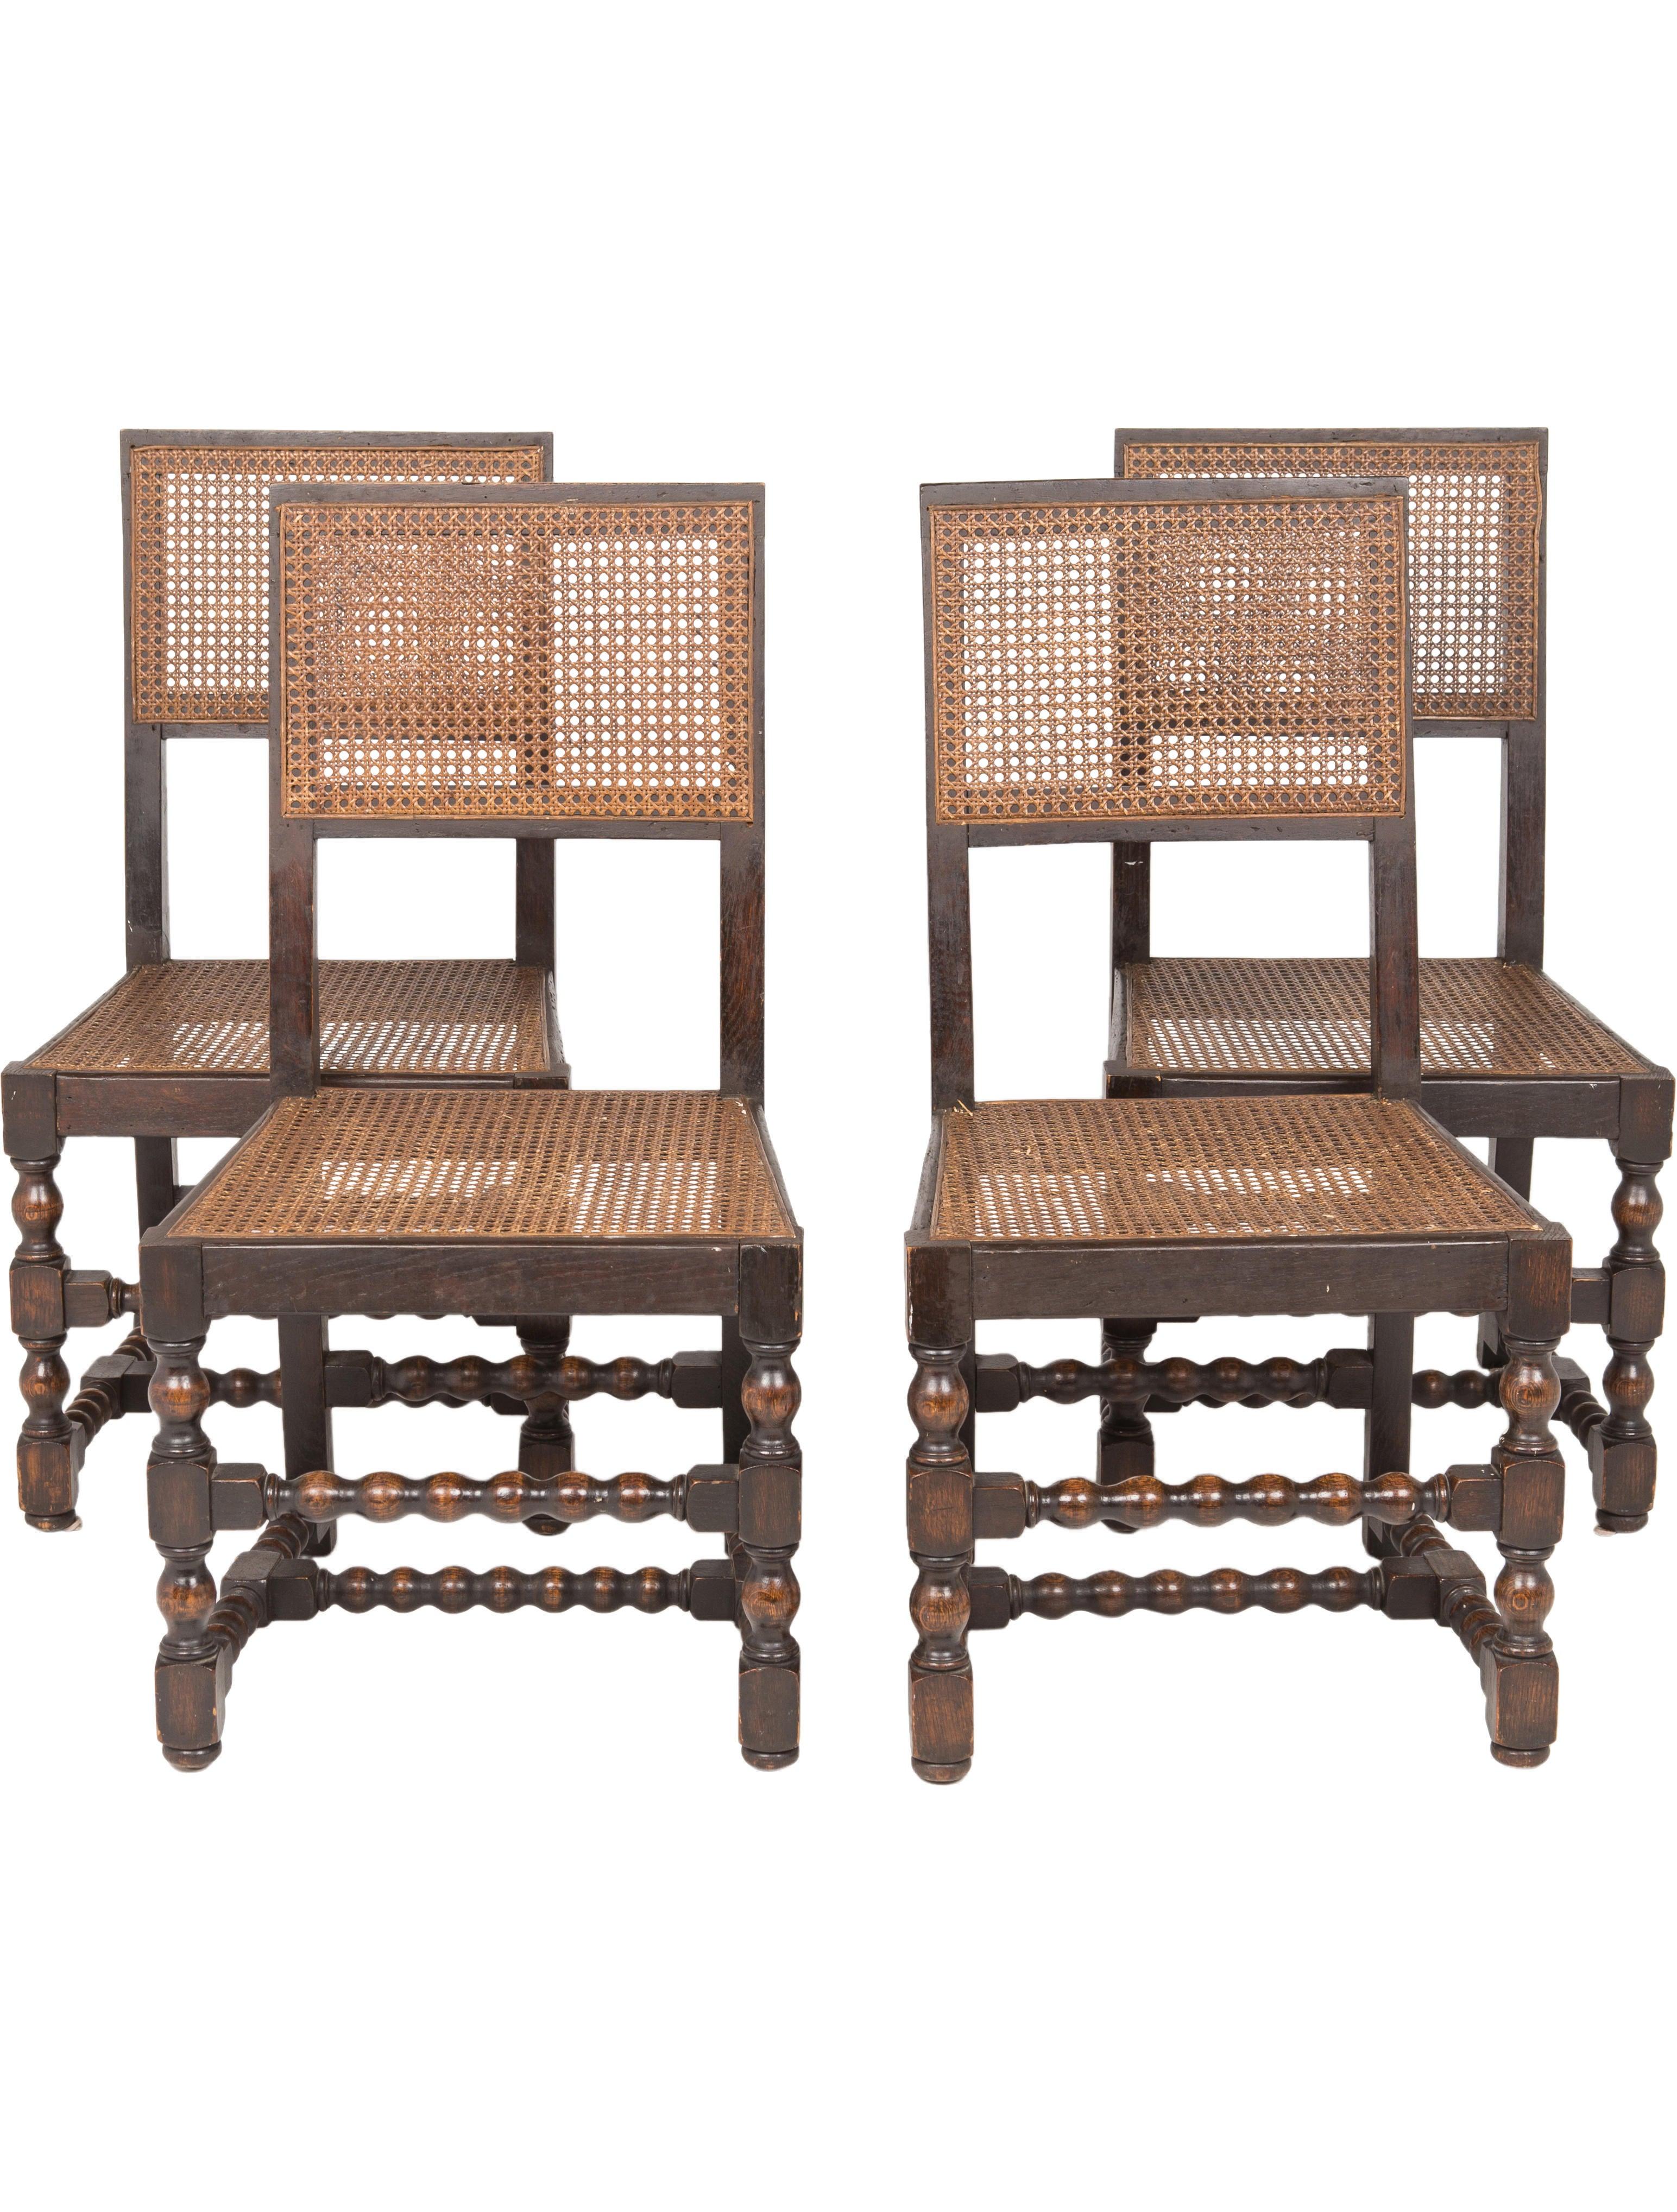 Merveilleux Set Of 4 Spanish Chairs